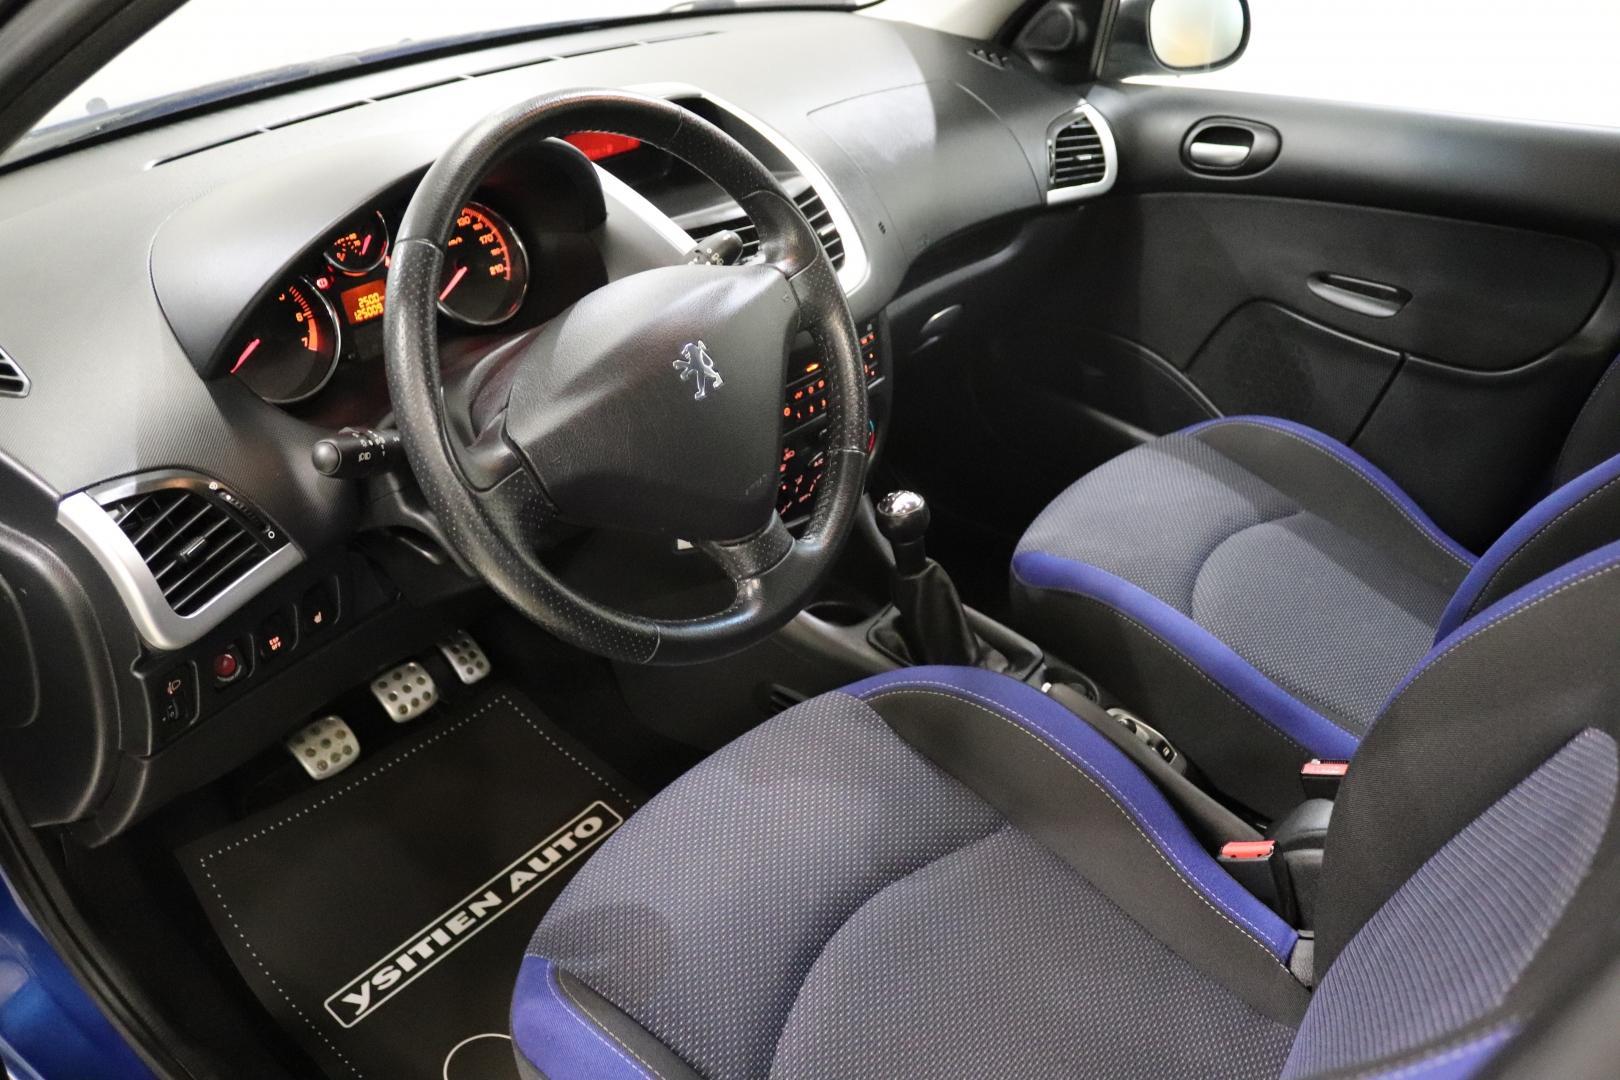 Peugeot 206+, Generation 75 5-ov